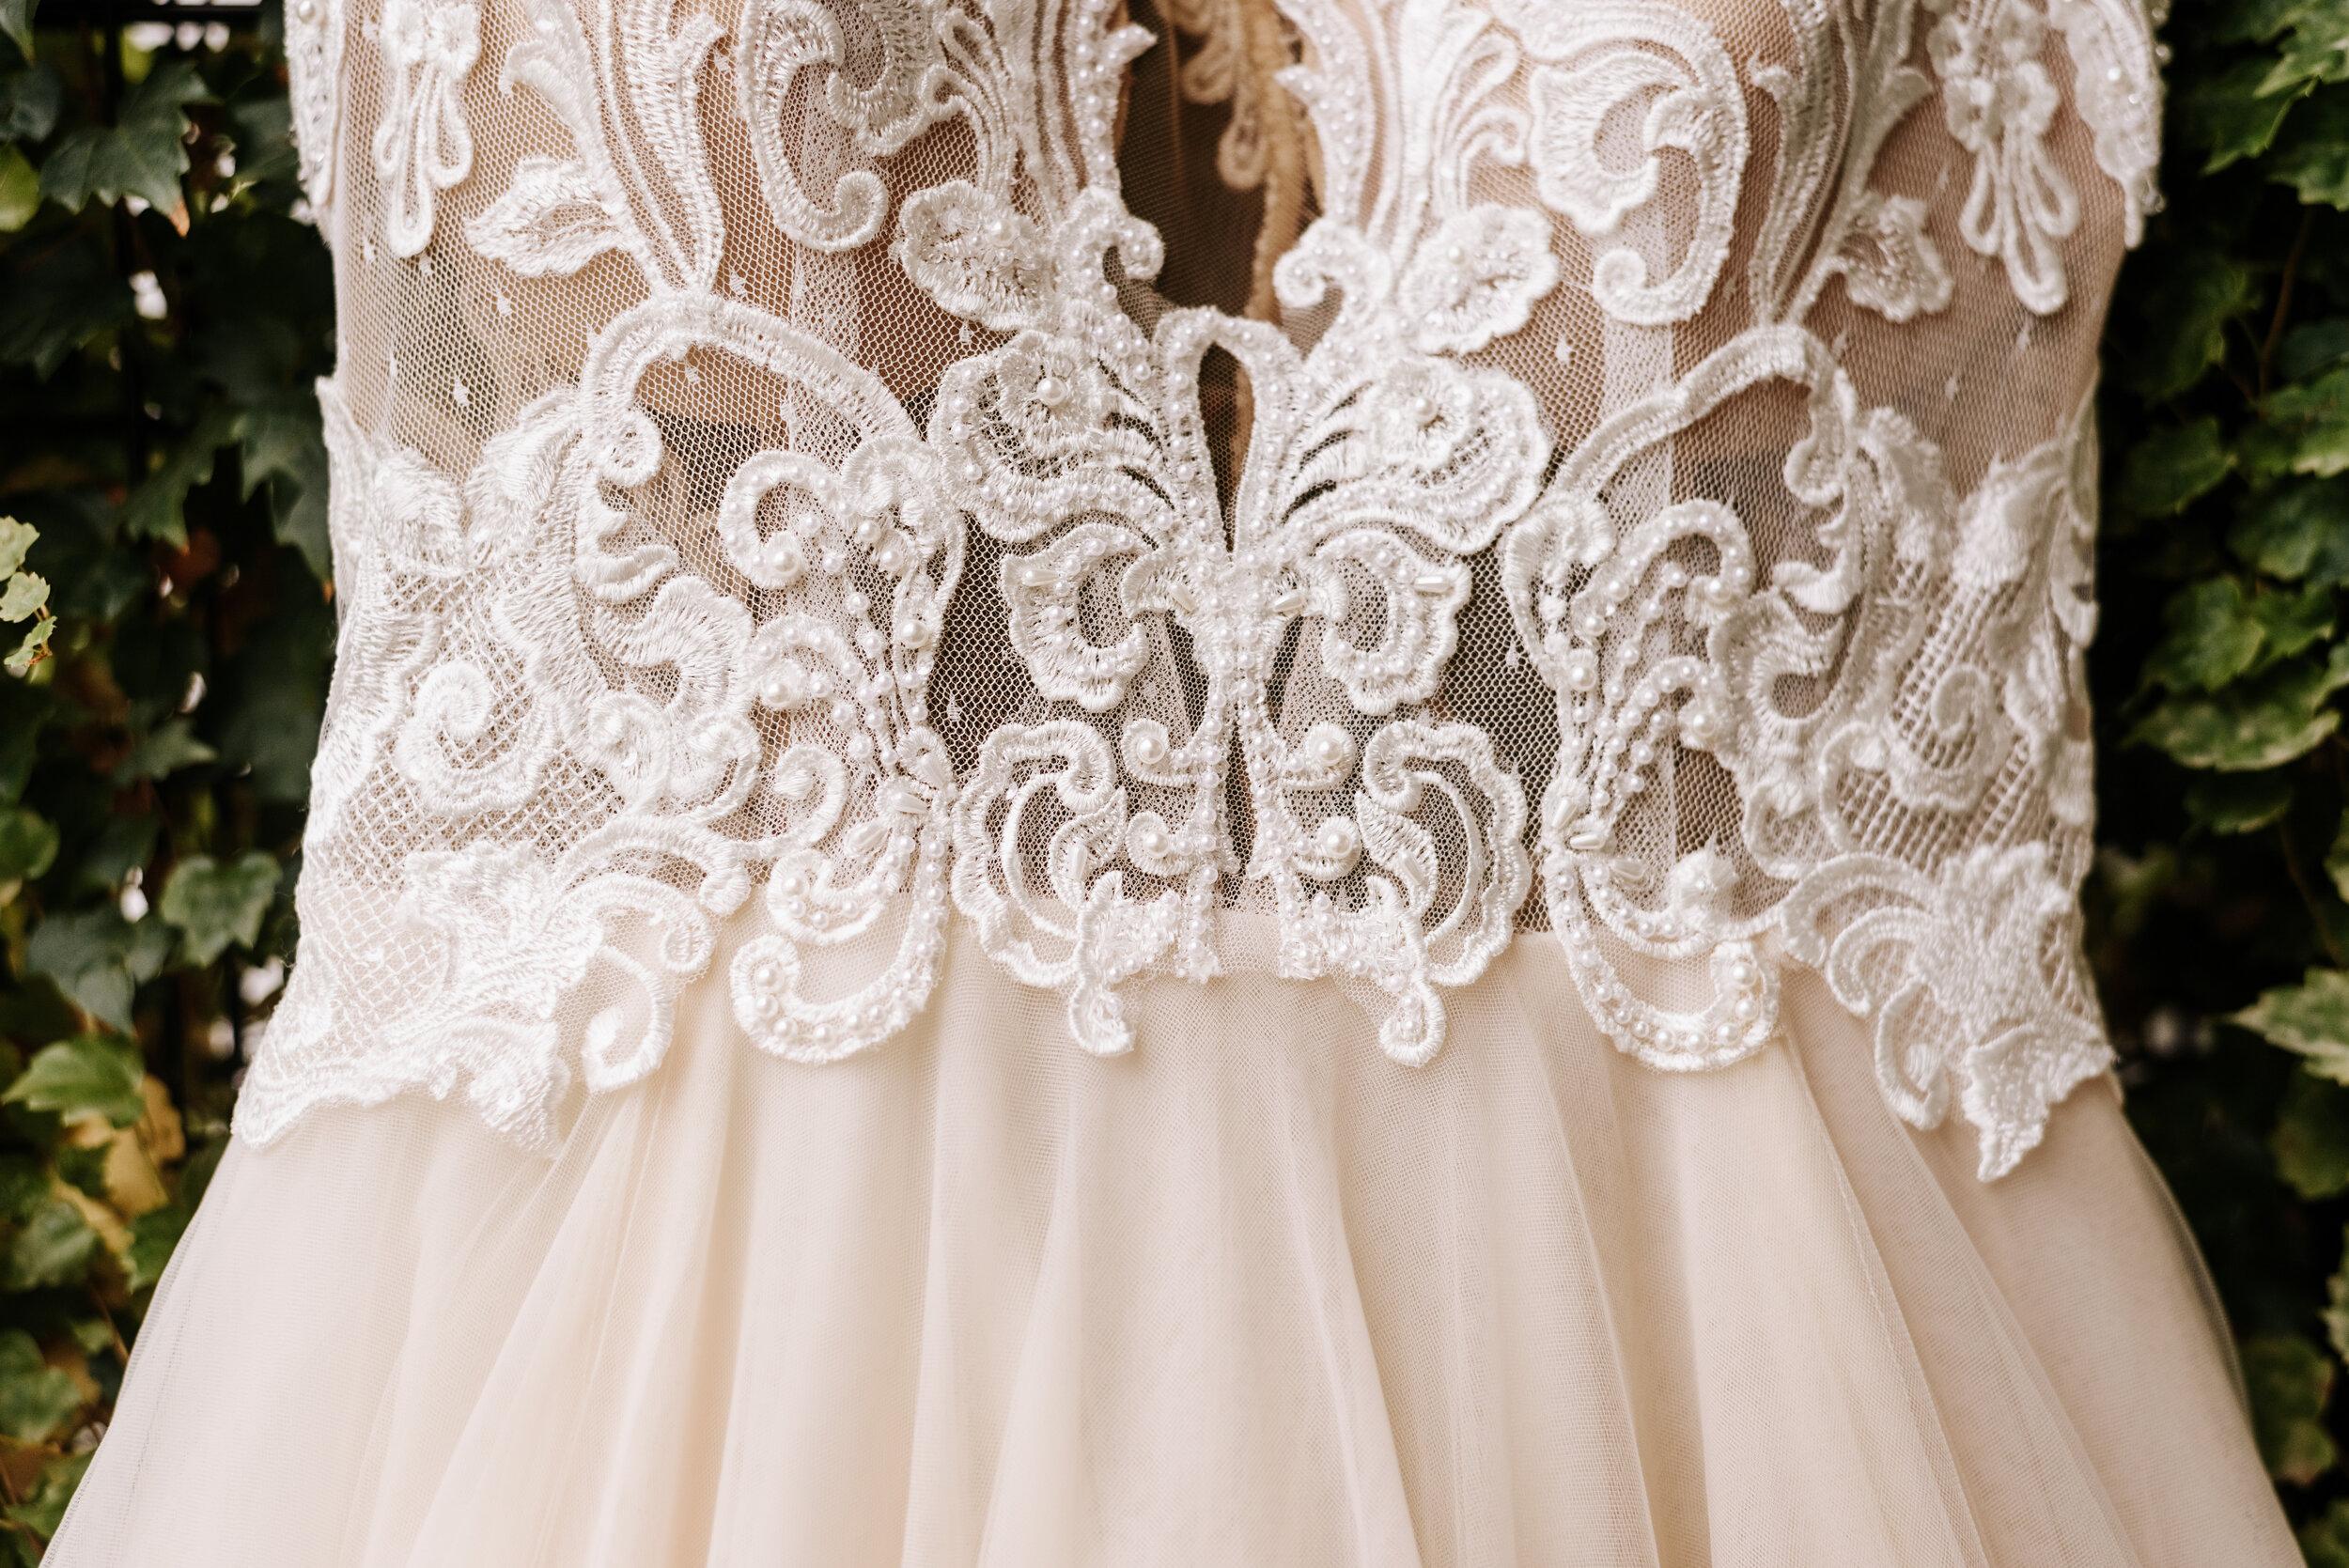 Cassie-Mrunal-Wedding-Quirk-Hotel-John-Marshall-Ballrooms-Richmond-Virginia-Photography-by-V-3.jpg